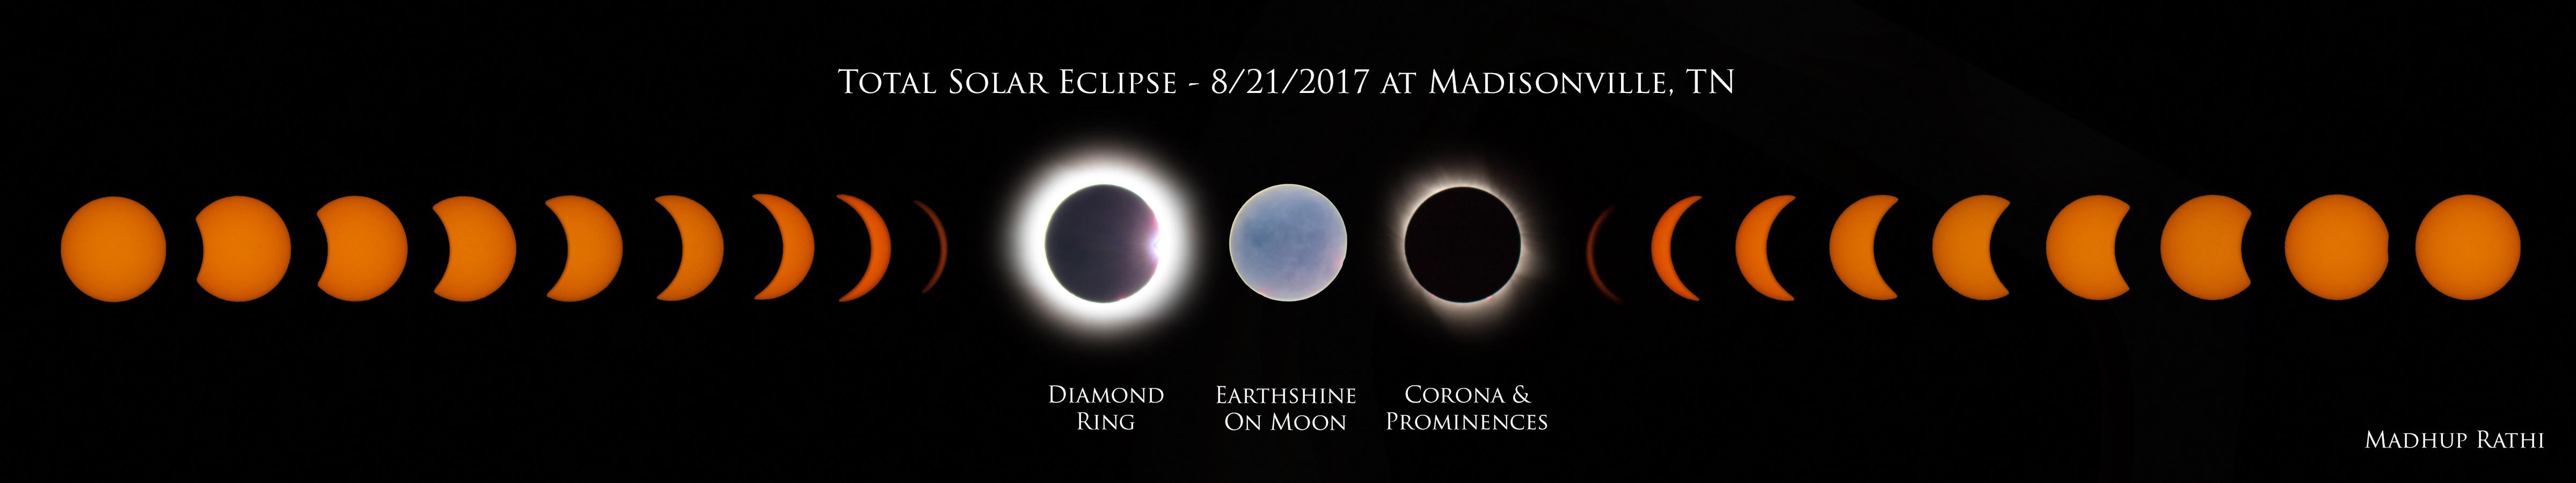 Solar-Eclipse-Timeline